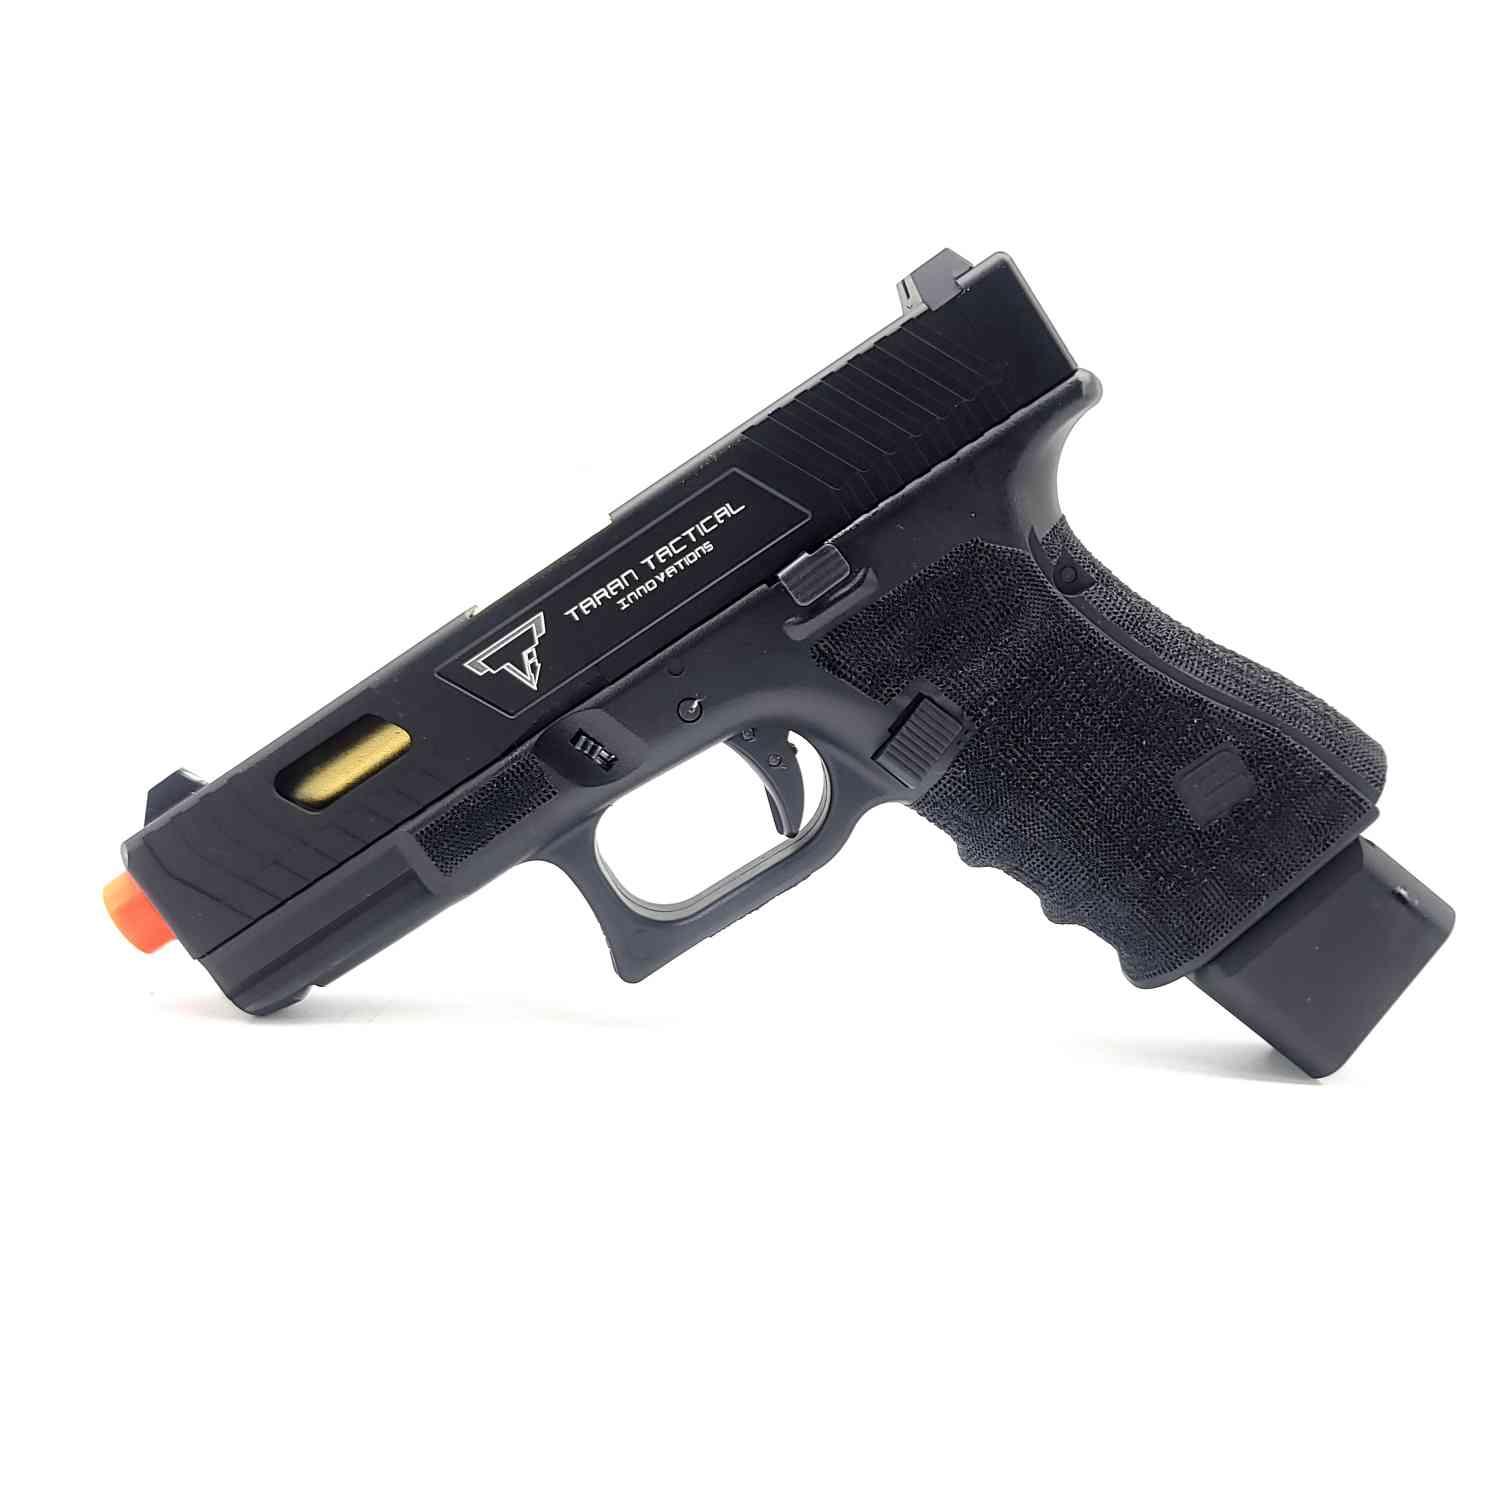 DOUBLE BELL Glock G19 TTI John Wick 2 Combat Master Custom Gas Powered Gel Blaster [772G]